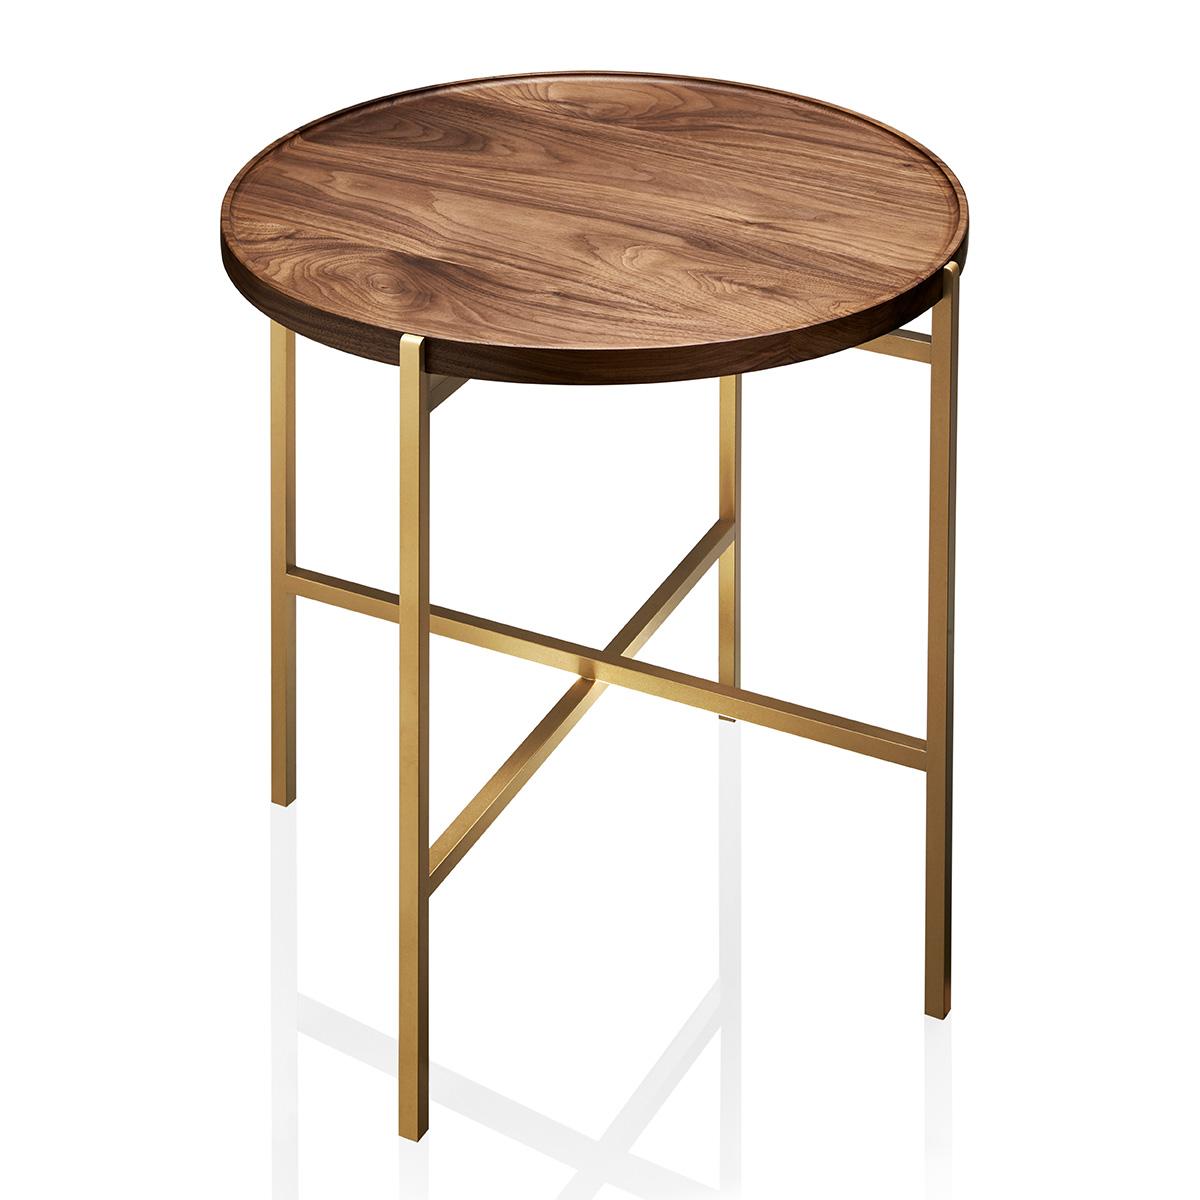 Table_Walnut-Wood_1a_WEB.jpg